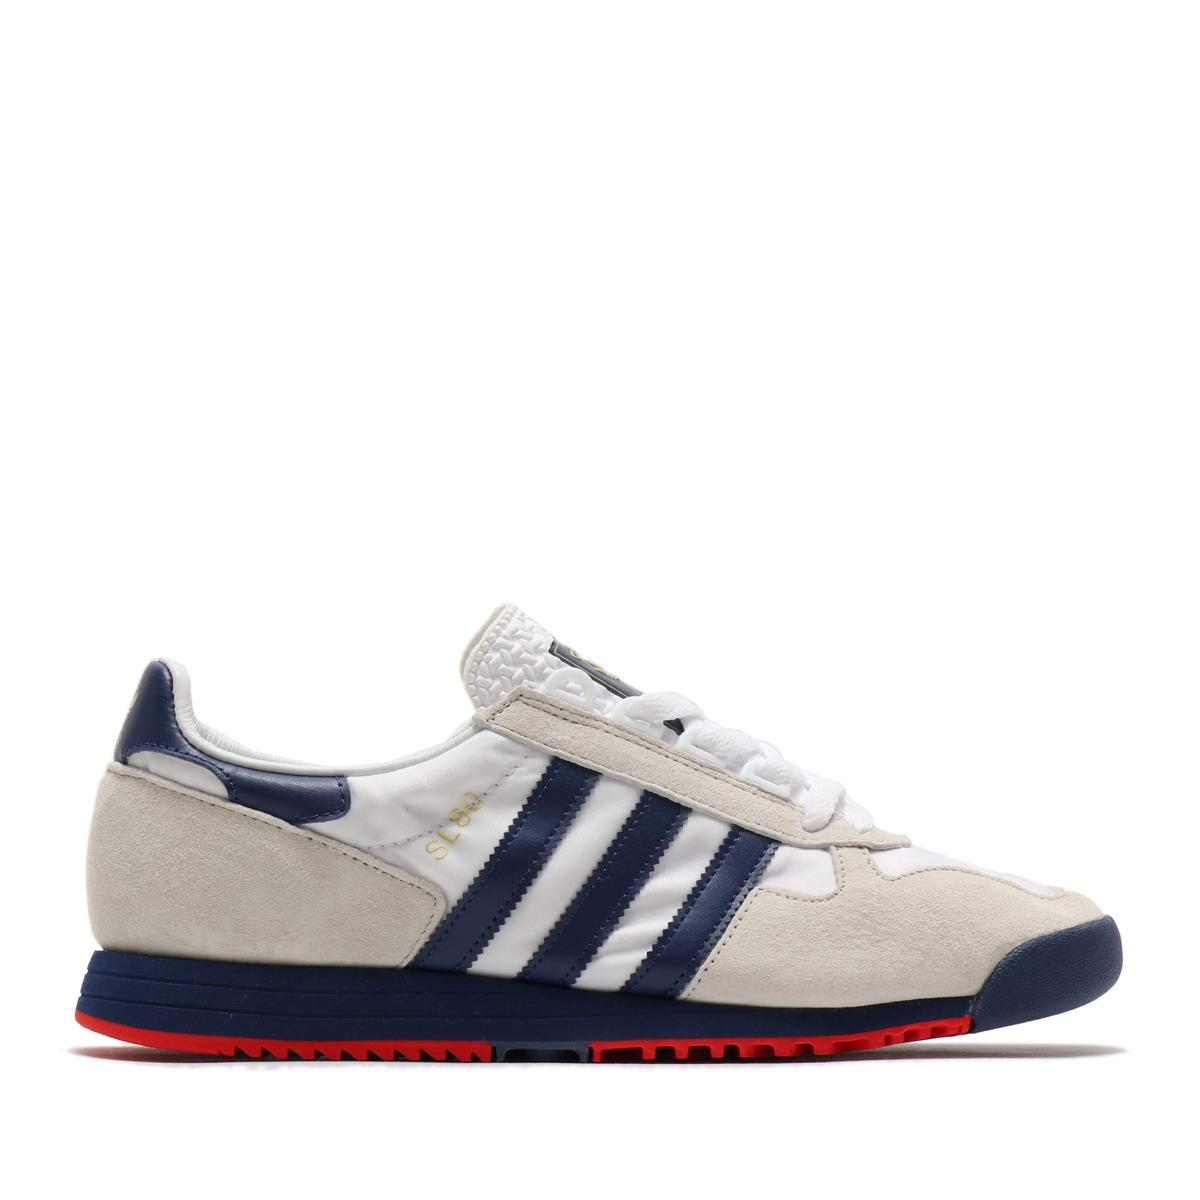 adidas SL 80(FOOTWEAR WHITE/TECH INDIGO/ORBIT GRAY)(アディダス エスエル 80)【メンズ】【レディース】【スニーカー】【20SS-S】